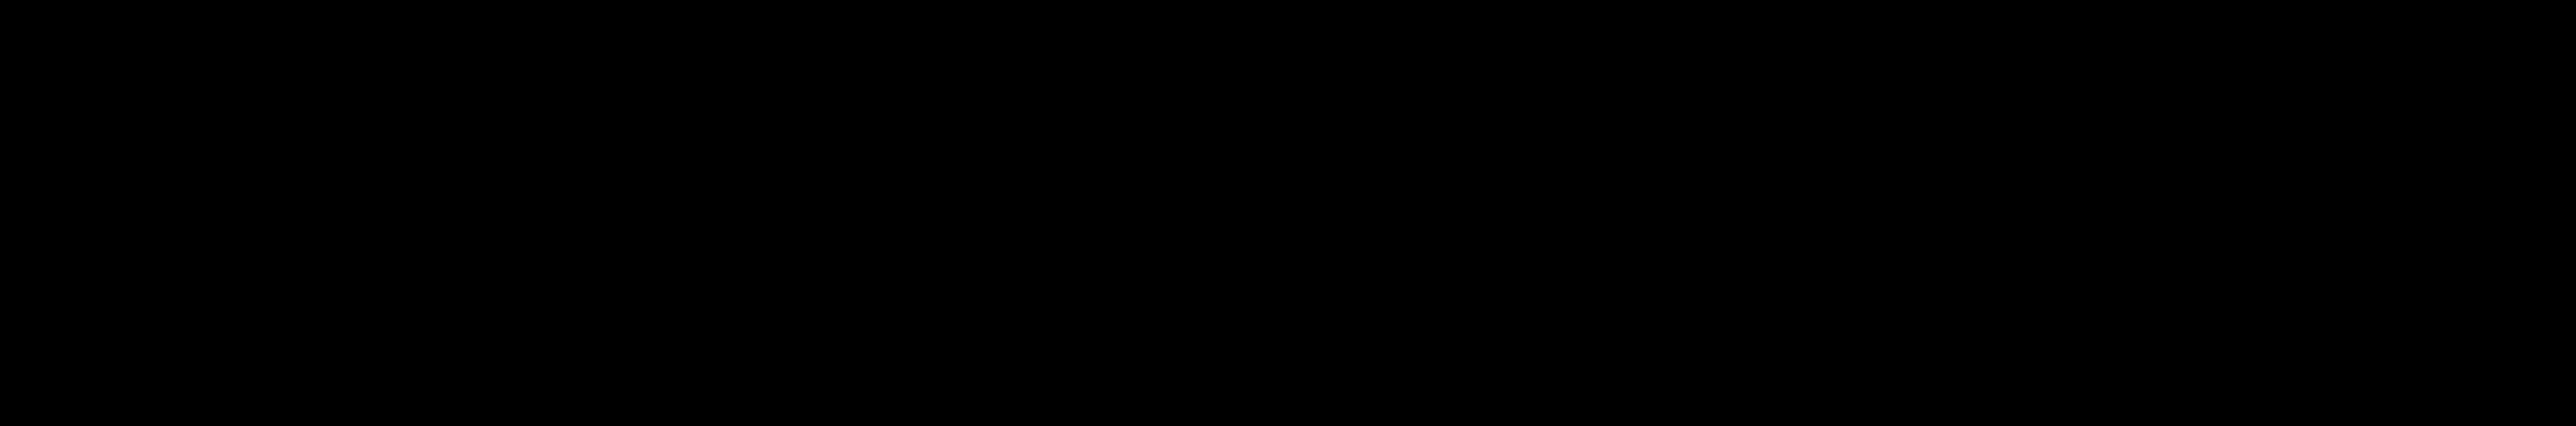 Avatar Logo (Film) png